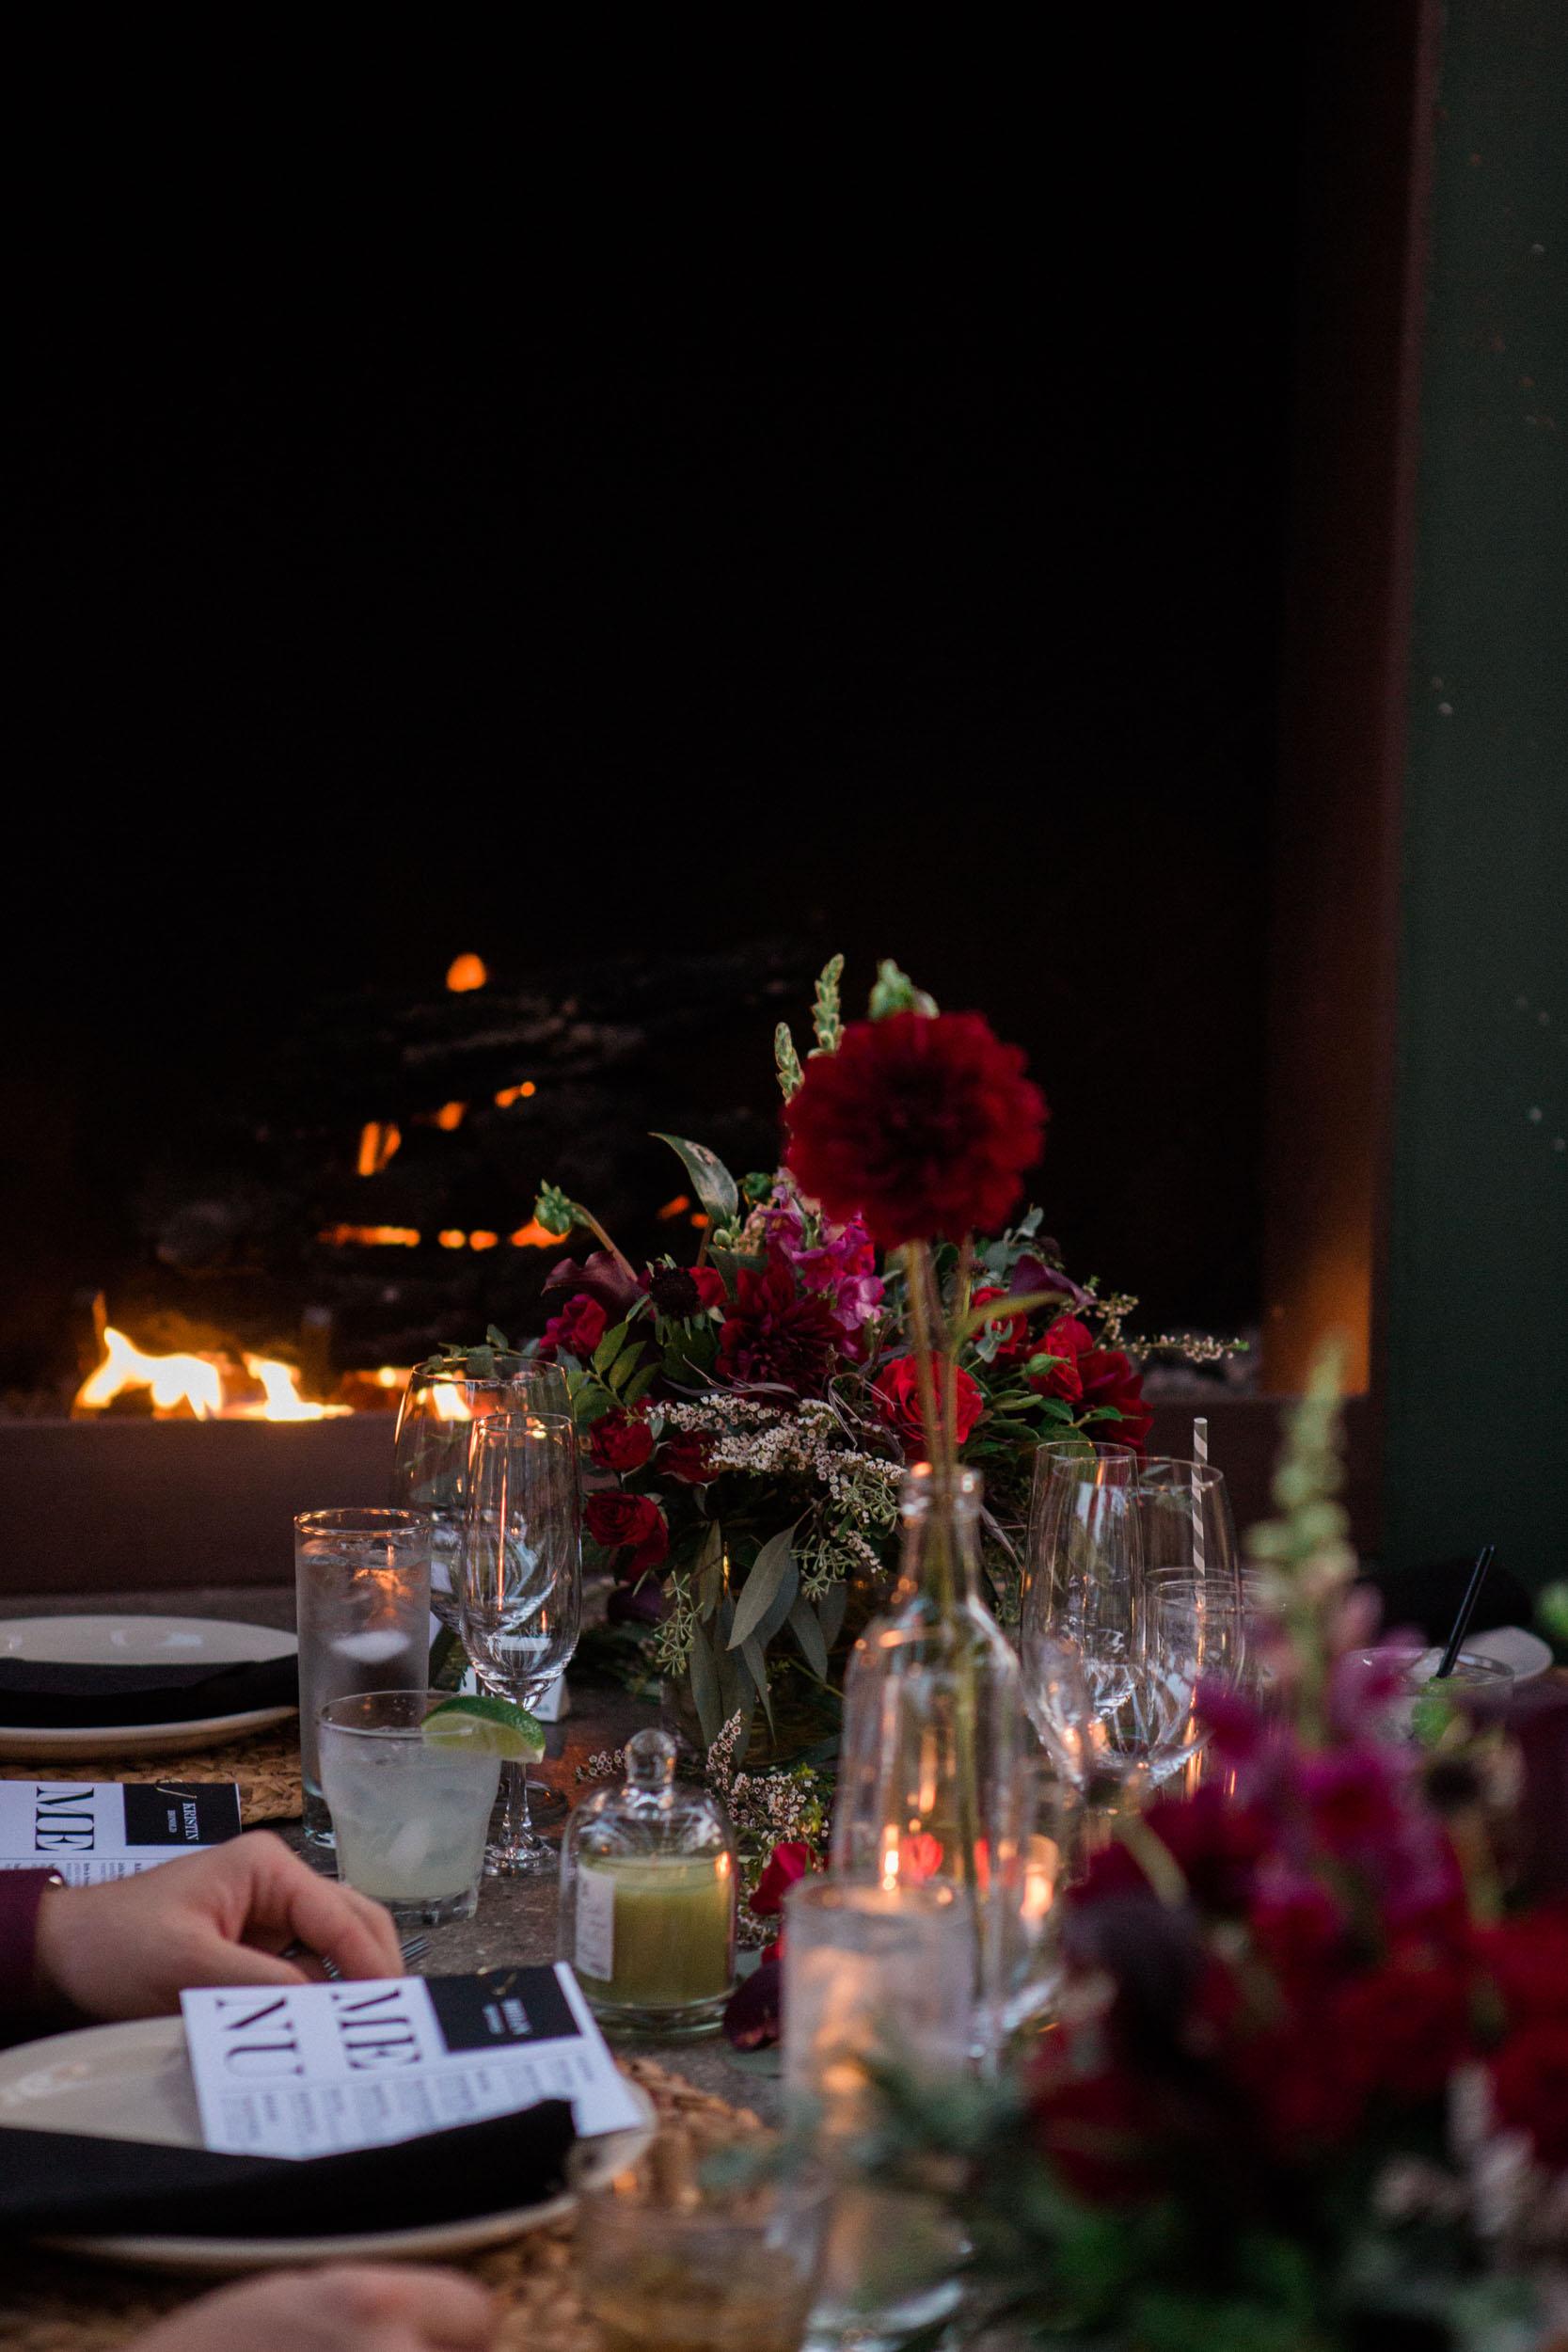 BKM-Photography-Highland-Park-Los-Angeles-Backyard-Wedding-0064.jpg